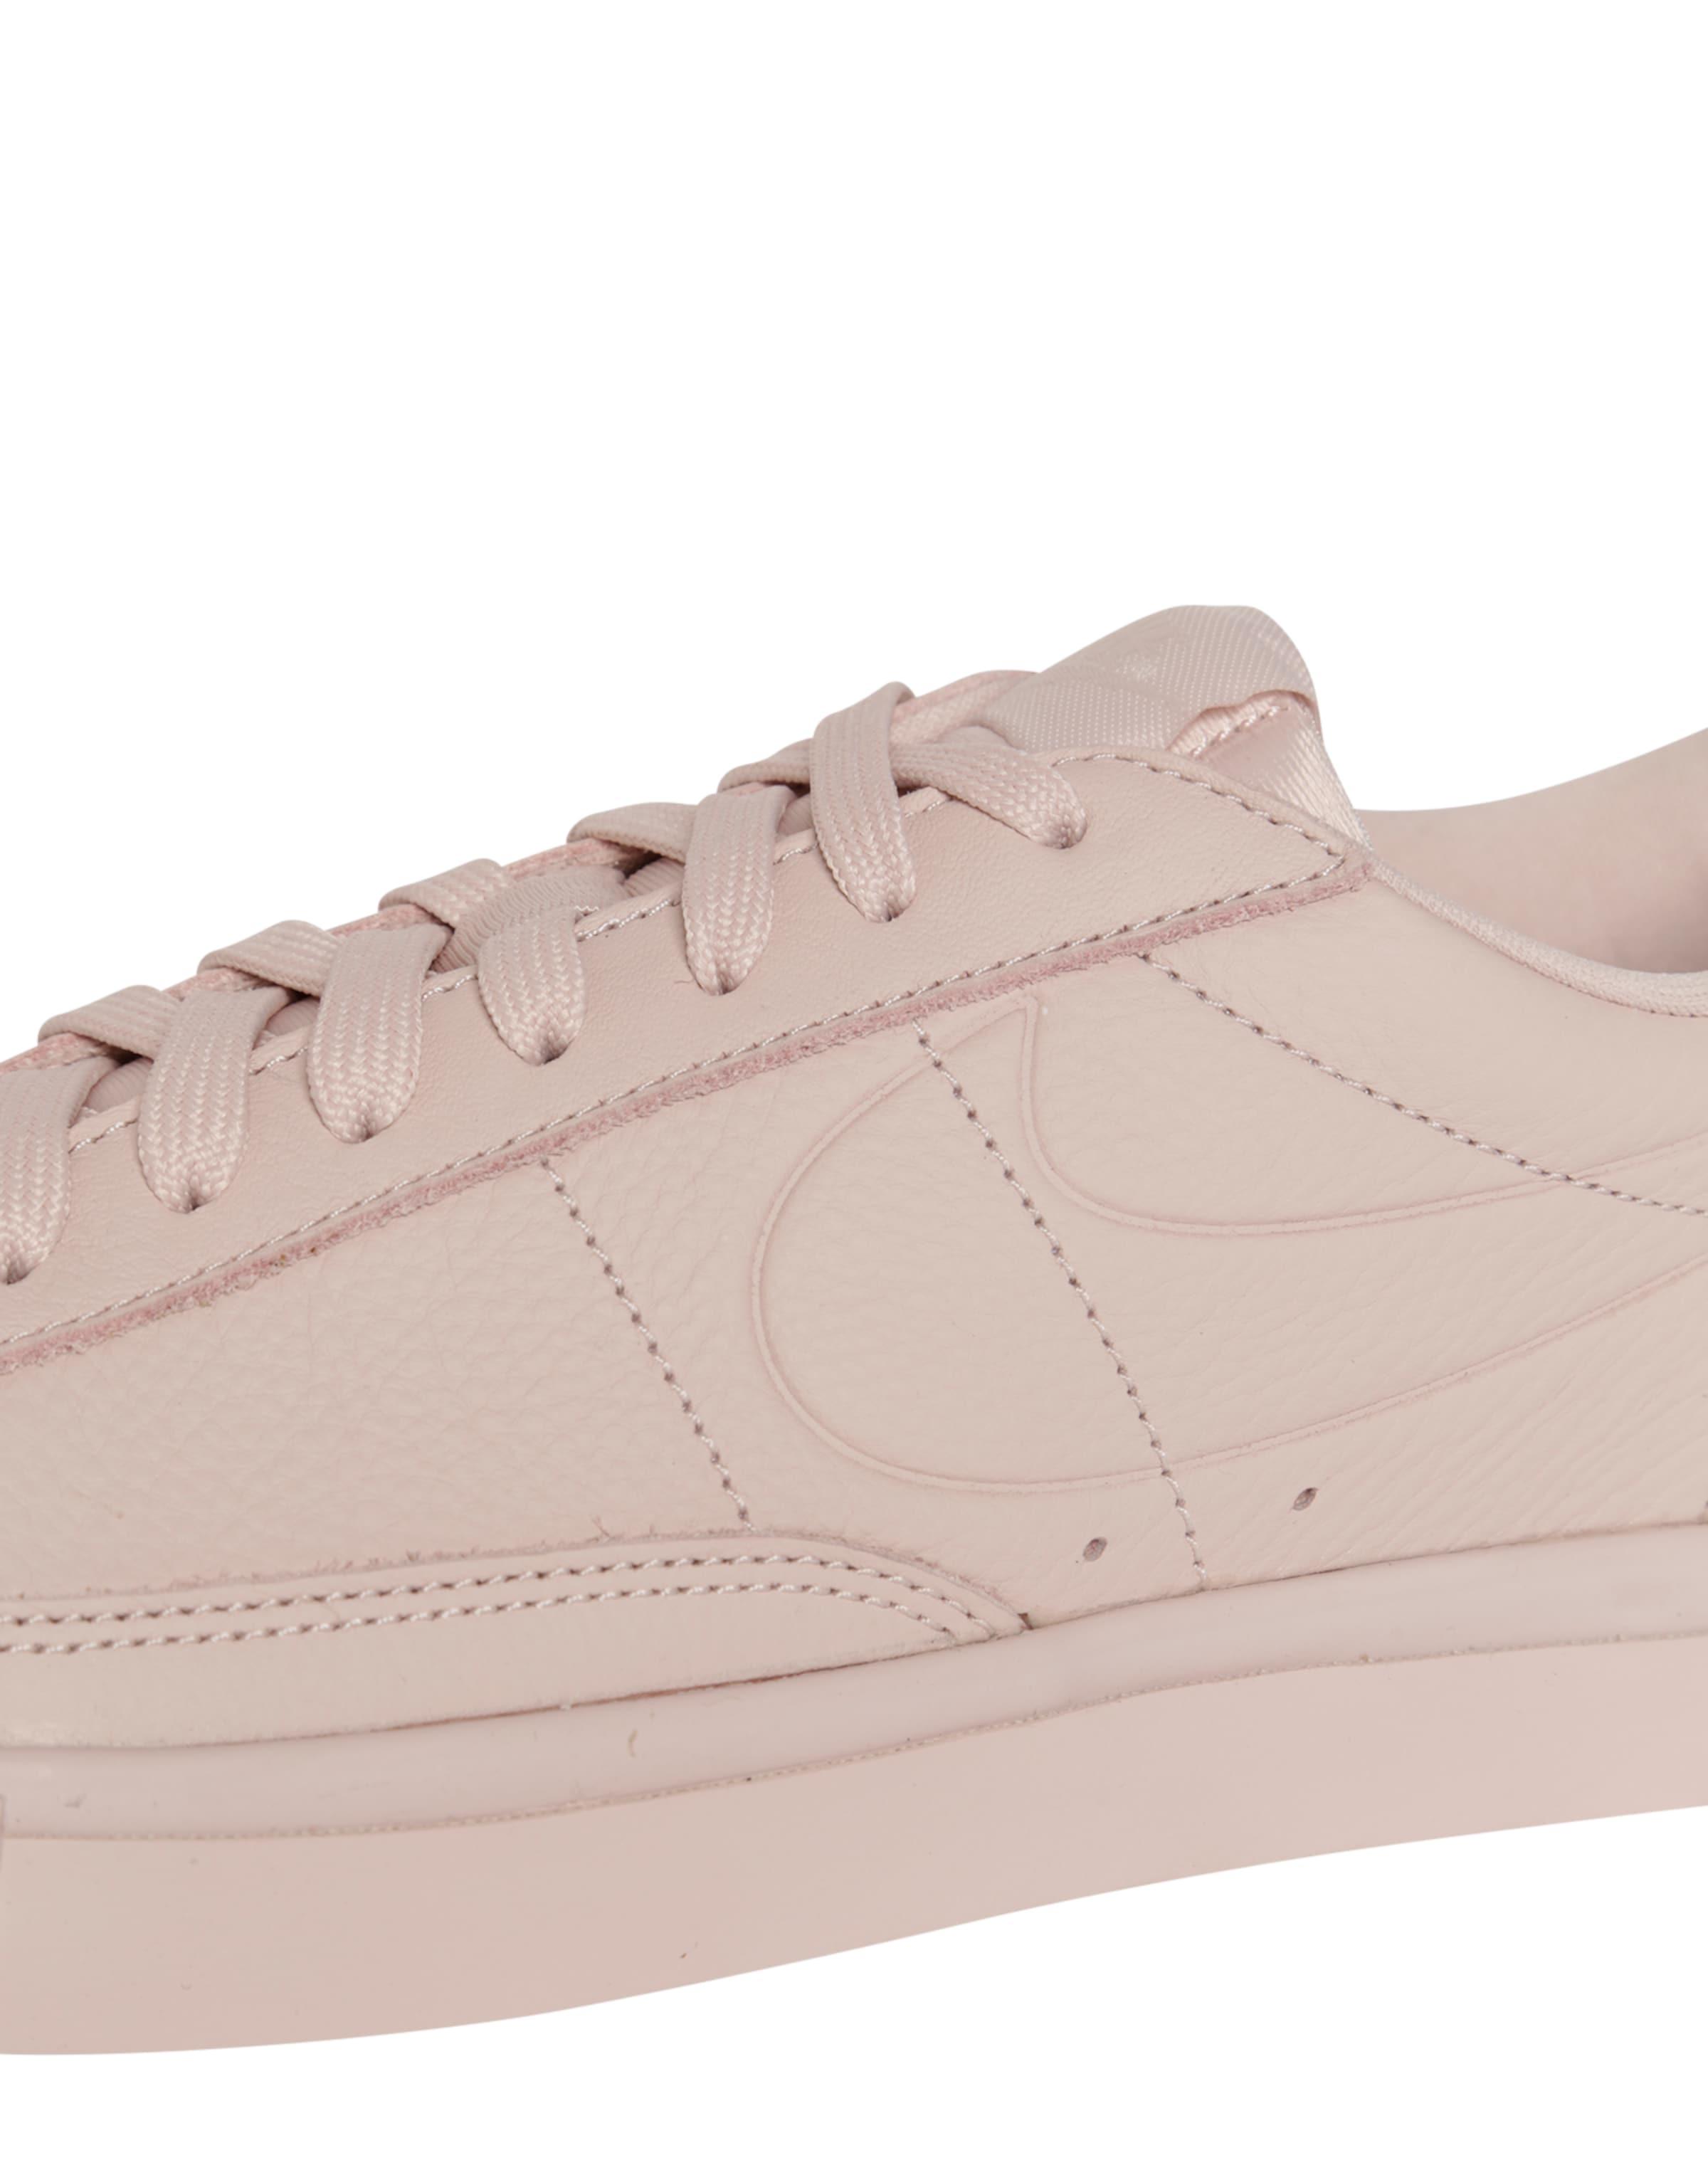 Nike Sportswear Low Turnschuhe 'Blazer Low Sportswear Leder Verkaufen Sie saisonale Aktionen dab1ed